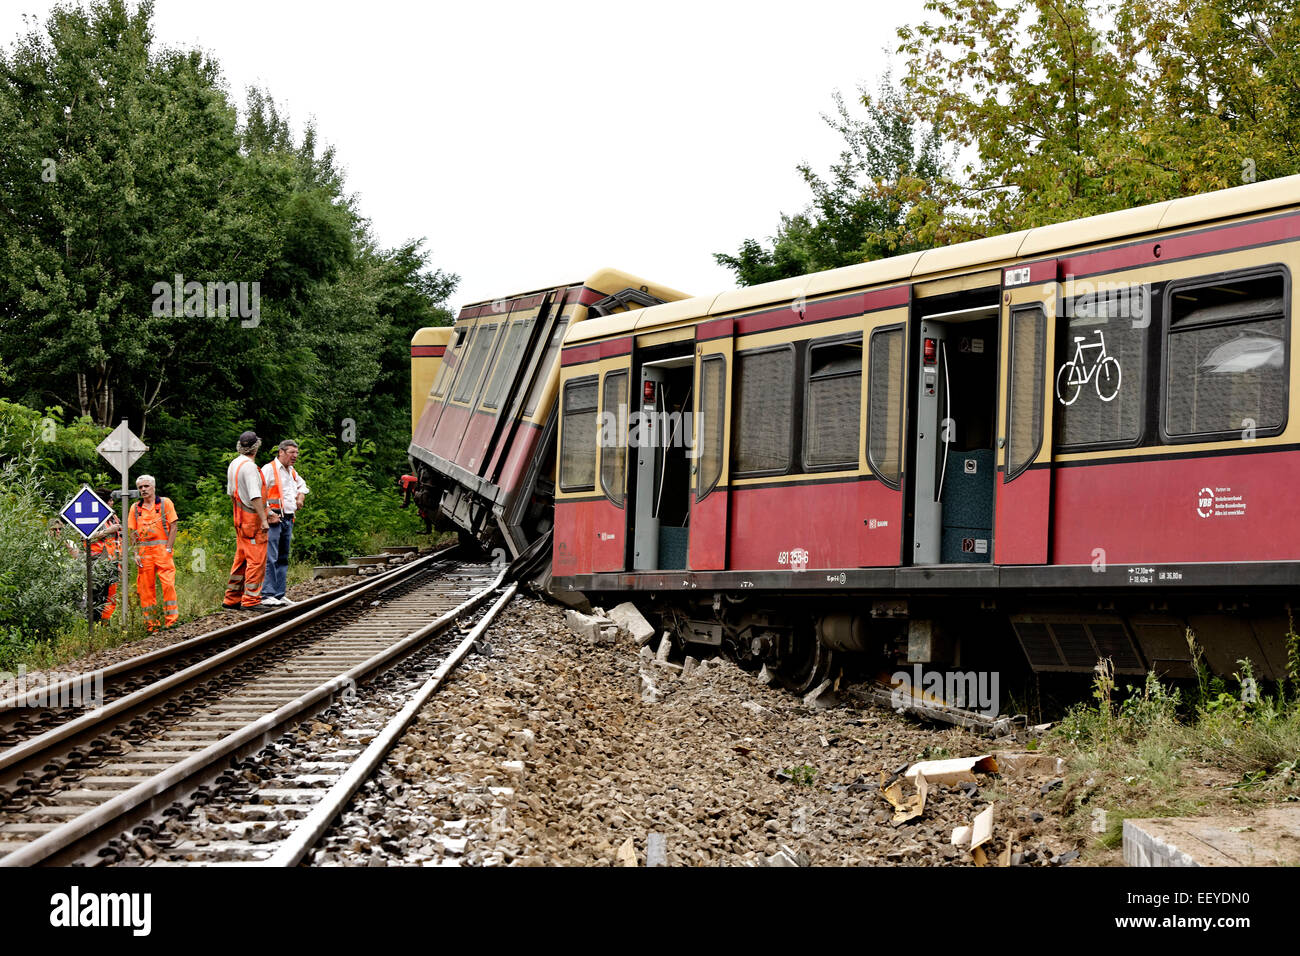 S-Bahn Berlin accident Stock Photo: 78050140 - Alamy